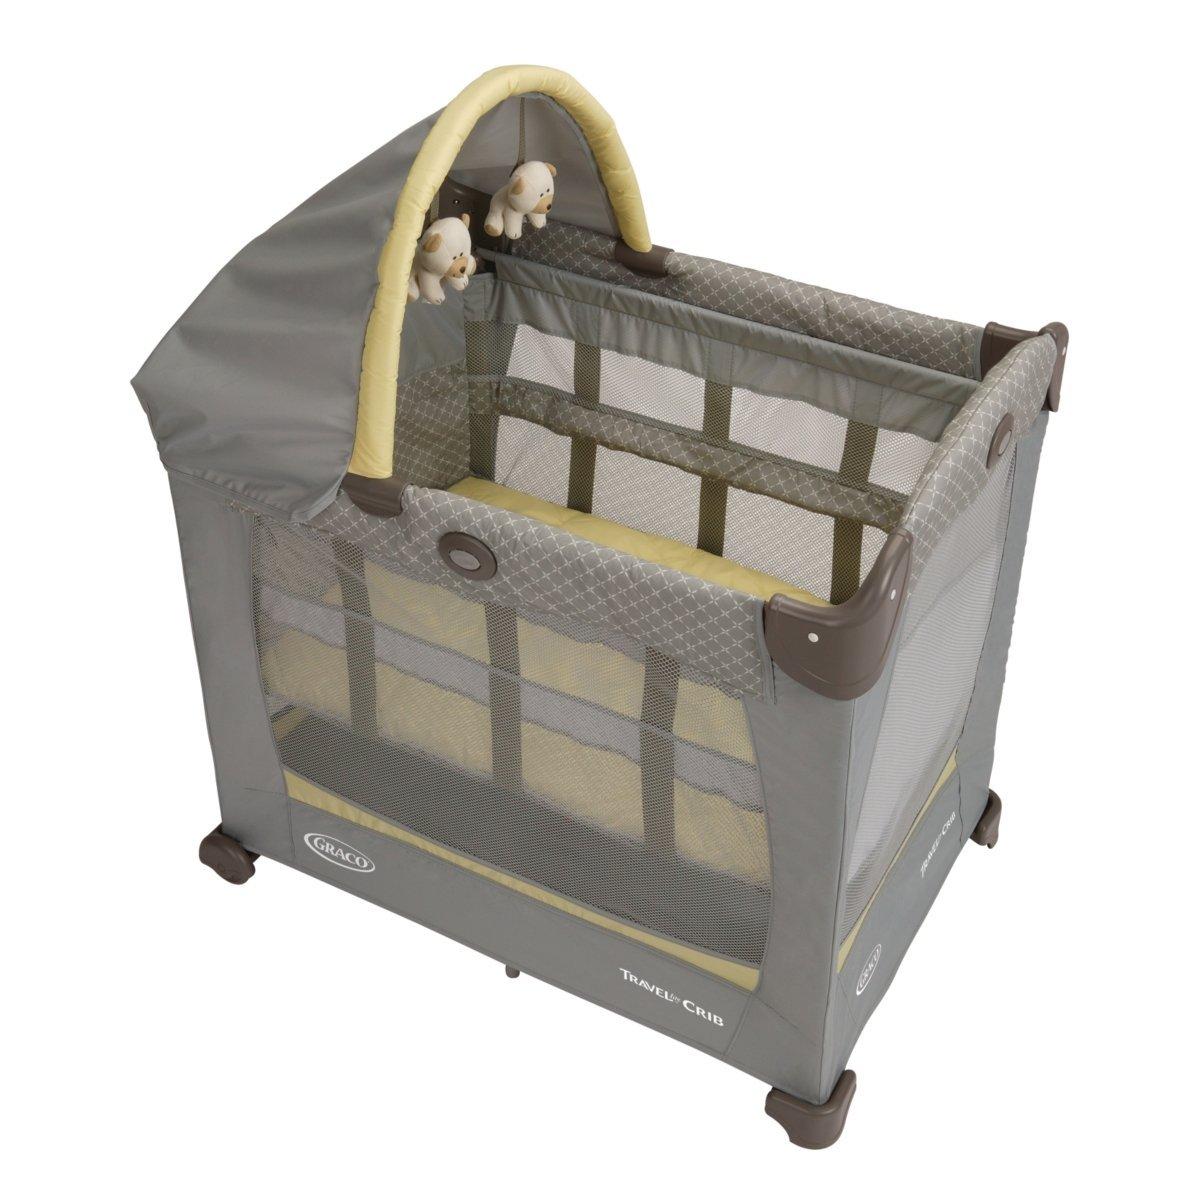 Gorgeous Graco Travel Lite Crib Travel Cribs Kids Lotus Travel Crib Uk Lotus Travel Crib Used Babies baby Lotus Travel Crib